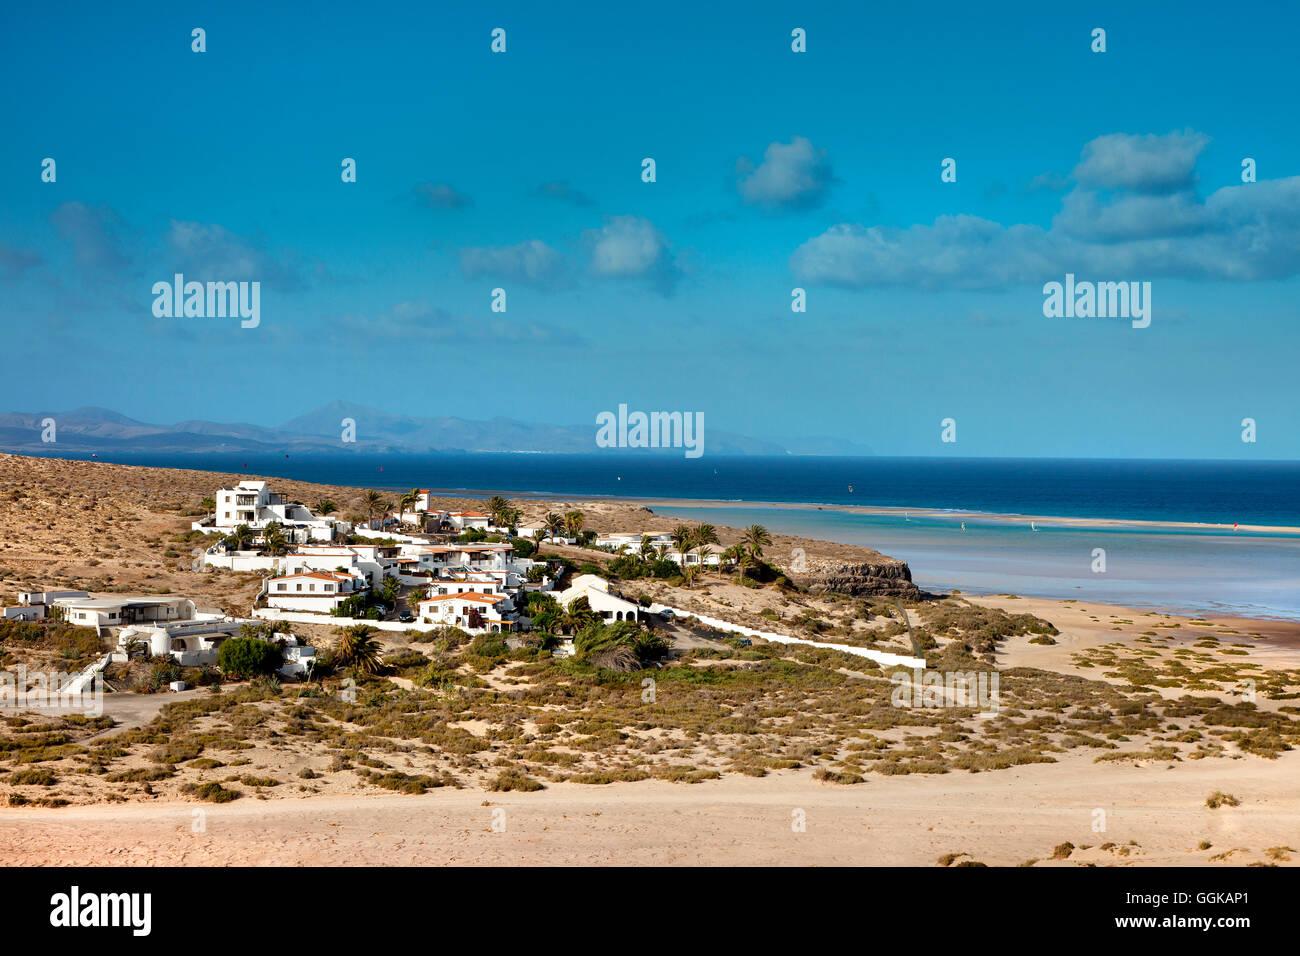 Beach, Playa Barca, Playa de Sotavento, Fuerteventura, Fuerteventura, Canary Islands, Spain - Stock Image